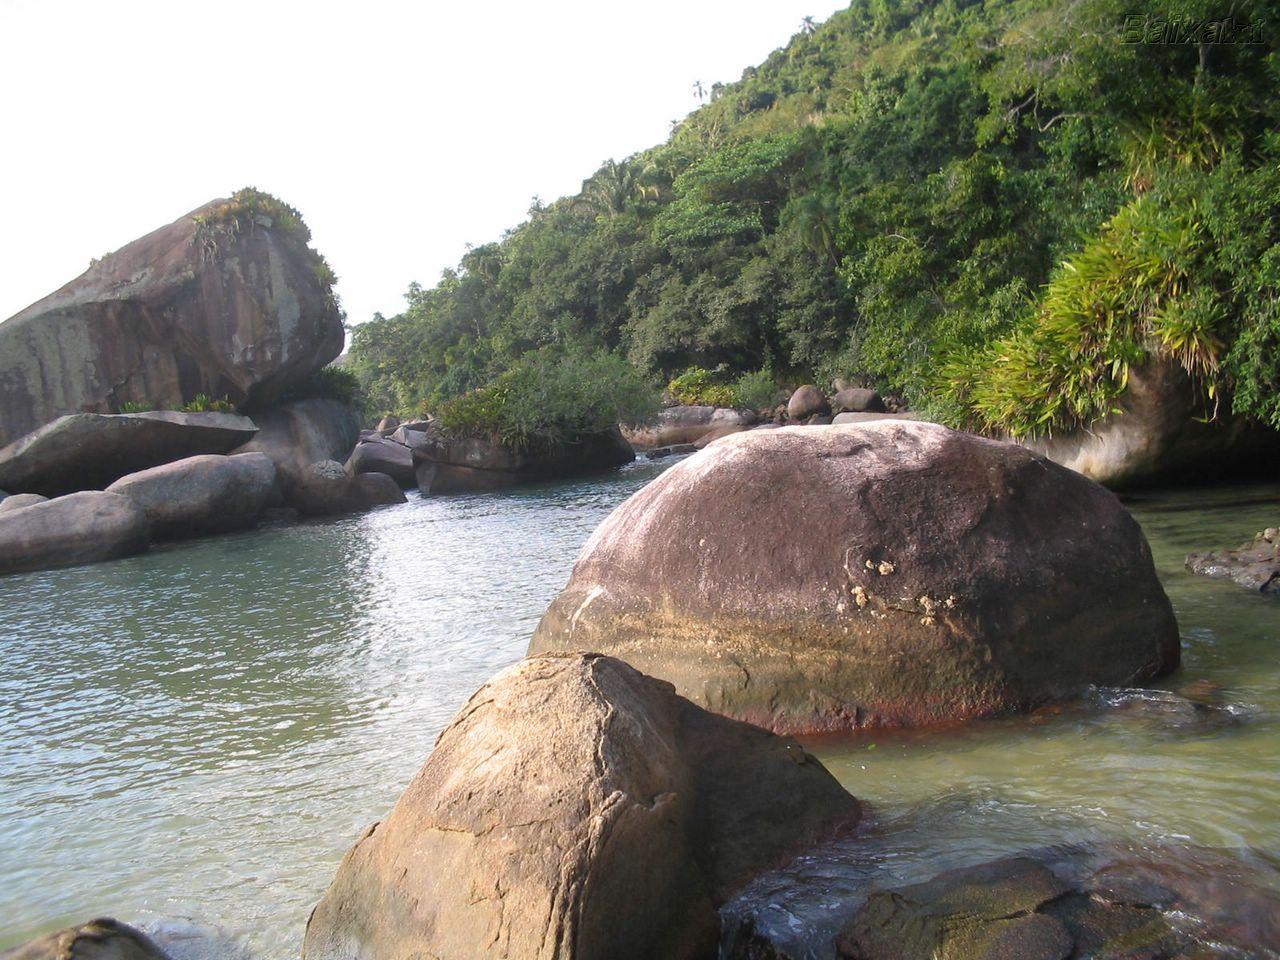 Остров Триндаде PP0T PY2ZA